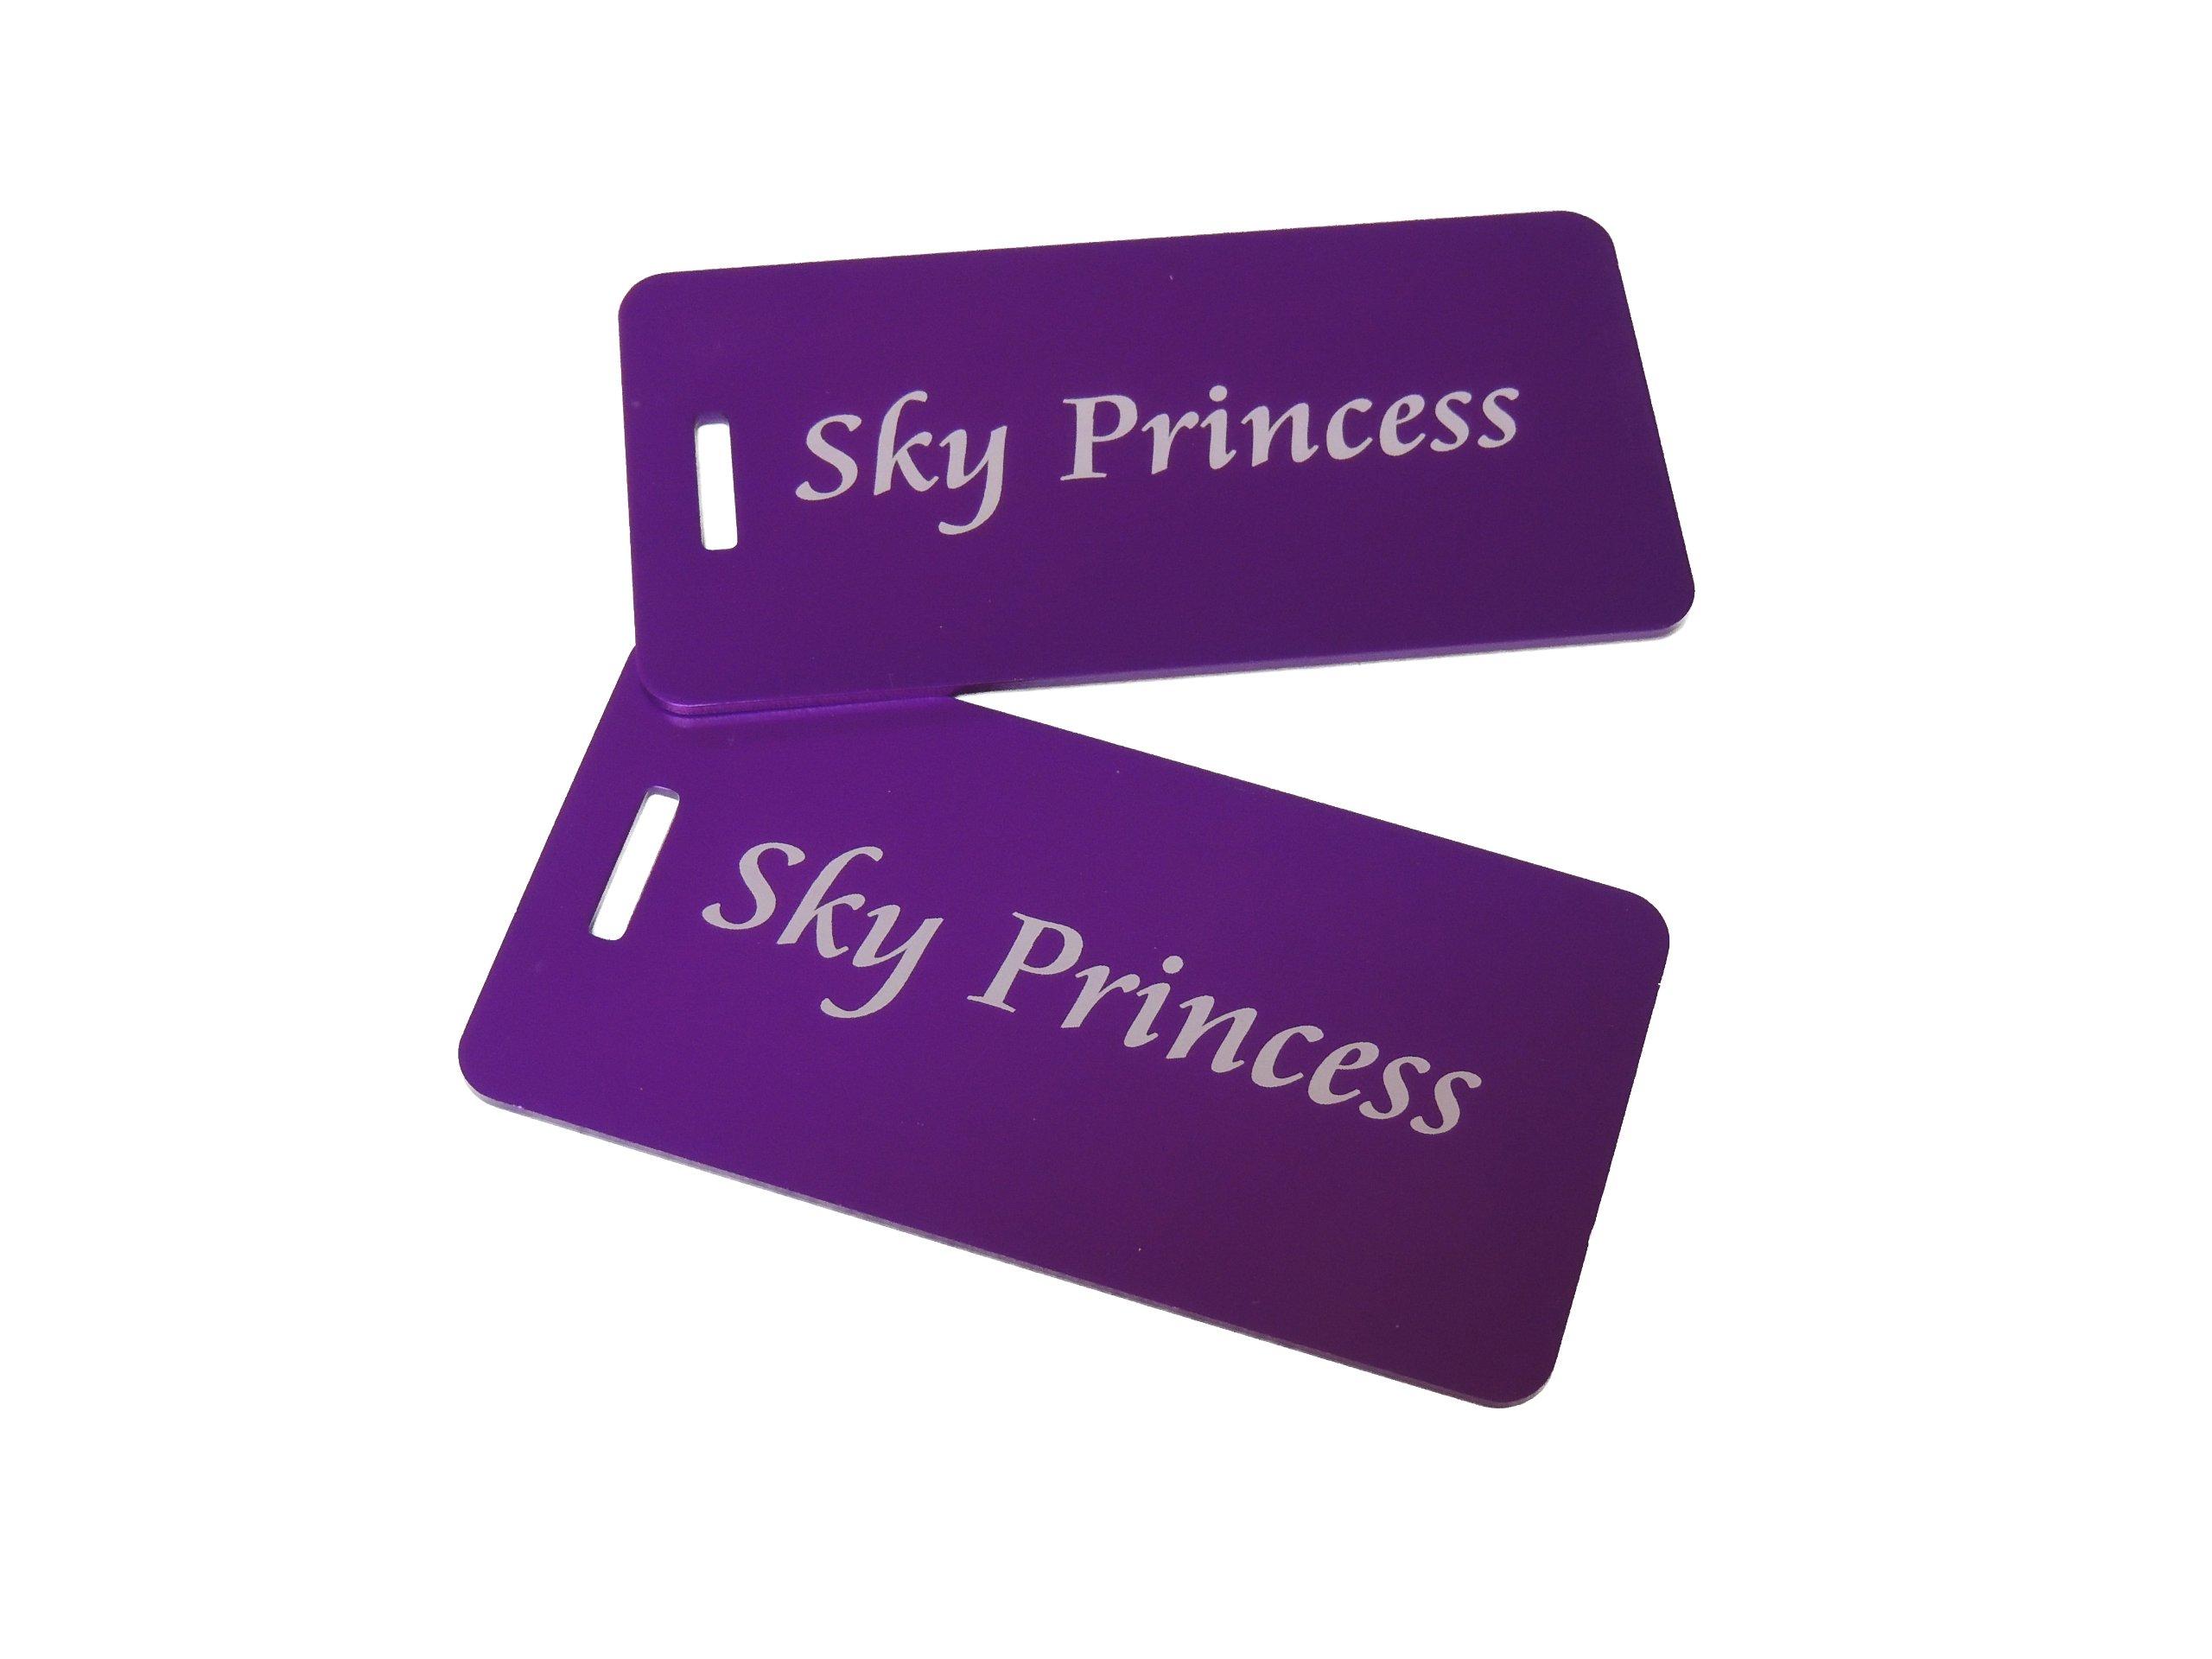 Flight Attendant Gifts, Sky Princess, Luggage Tags, Flight Attendant Bag Tag, (Purple)